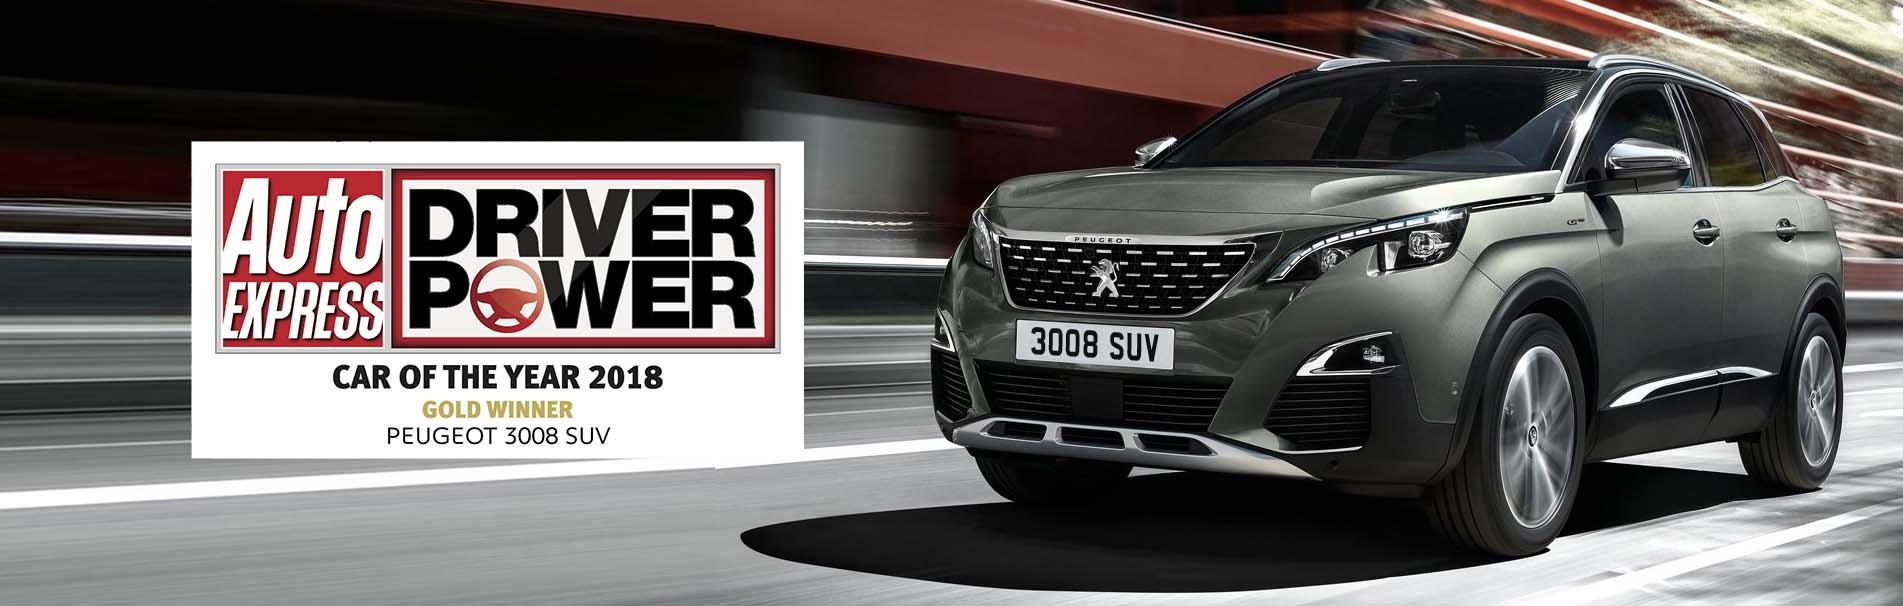 2018-driver-power-award-auto-express-3008-suv-winner-sli